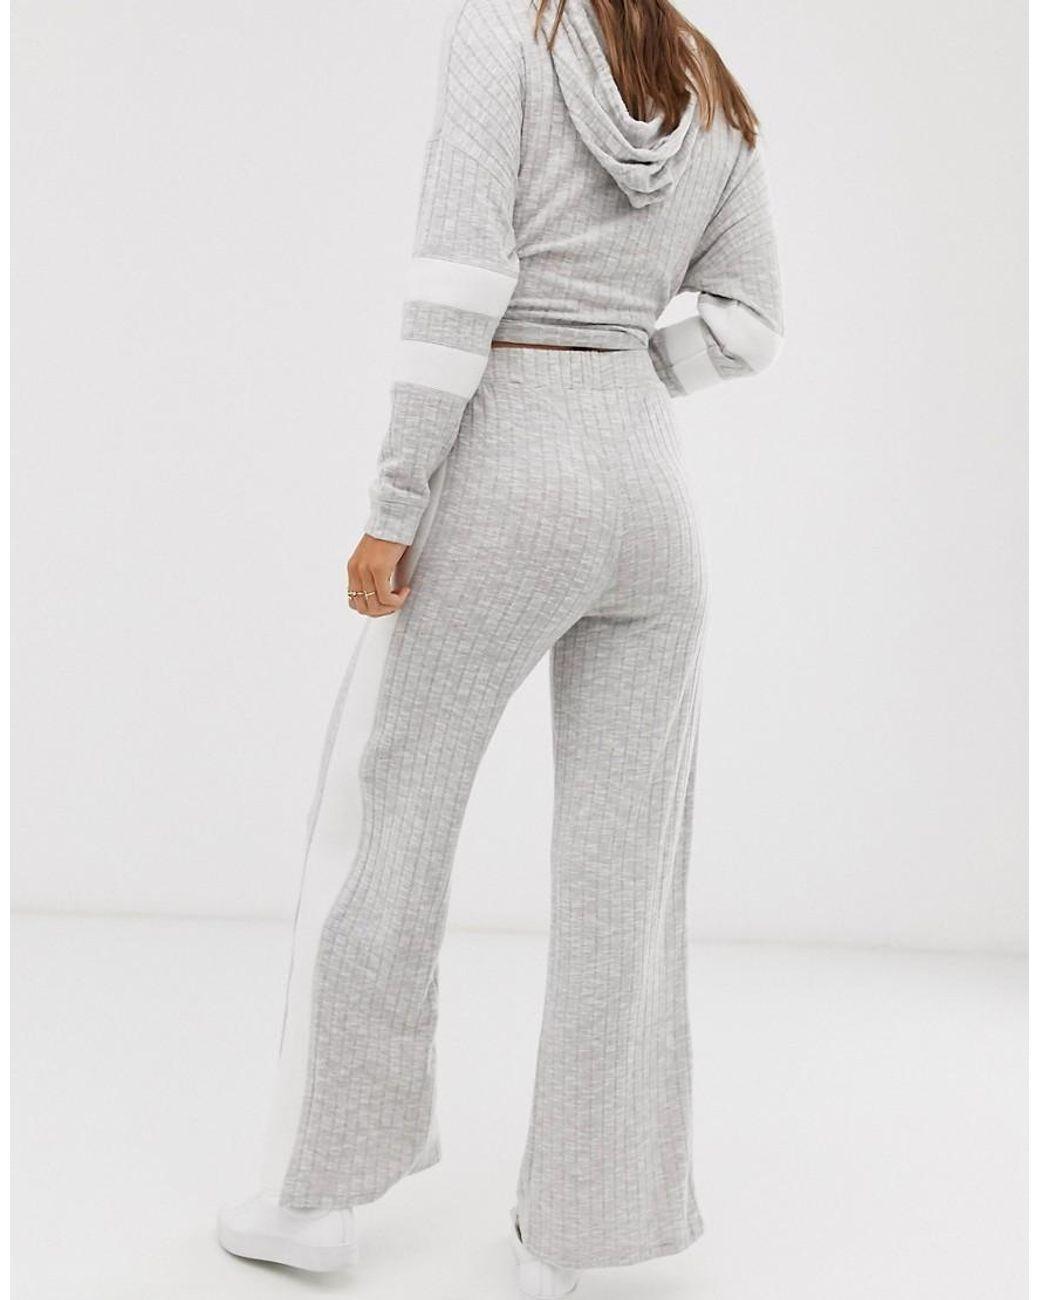 Pantalon large côtelé (ensemble